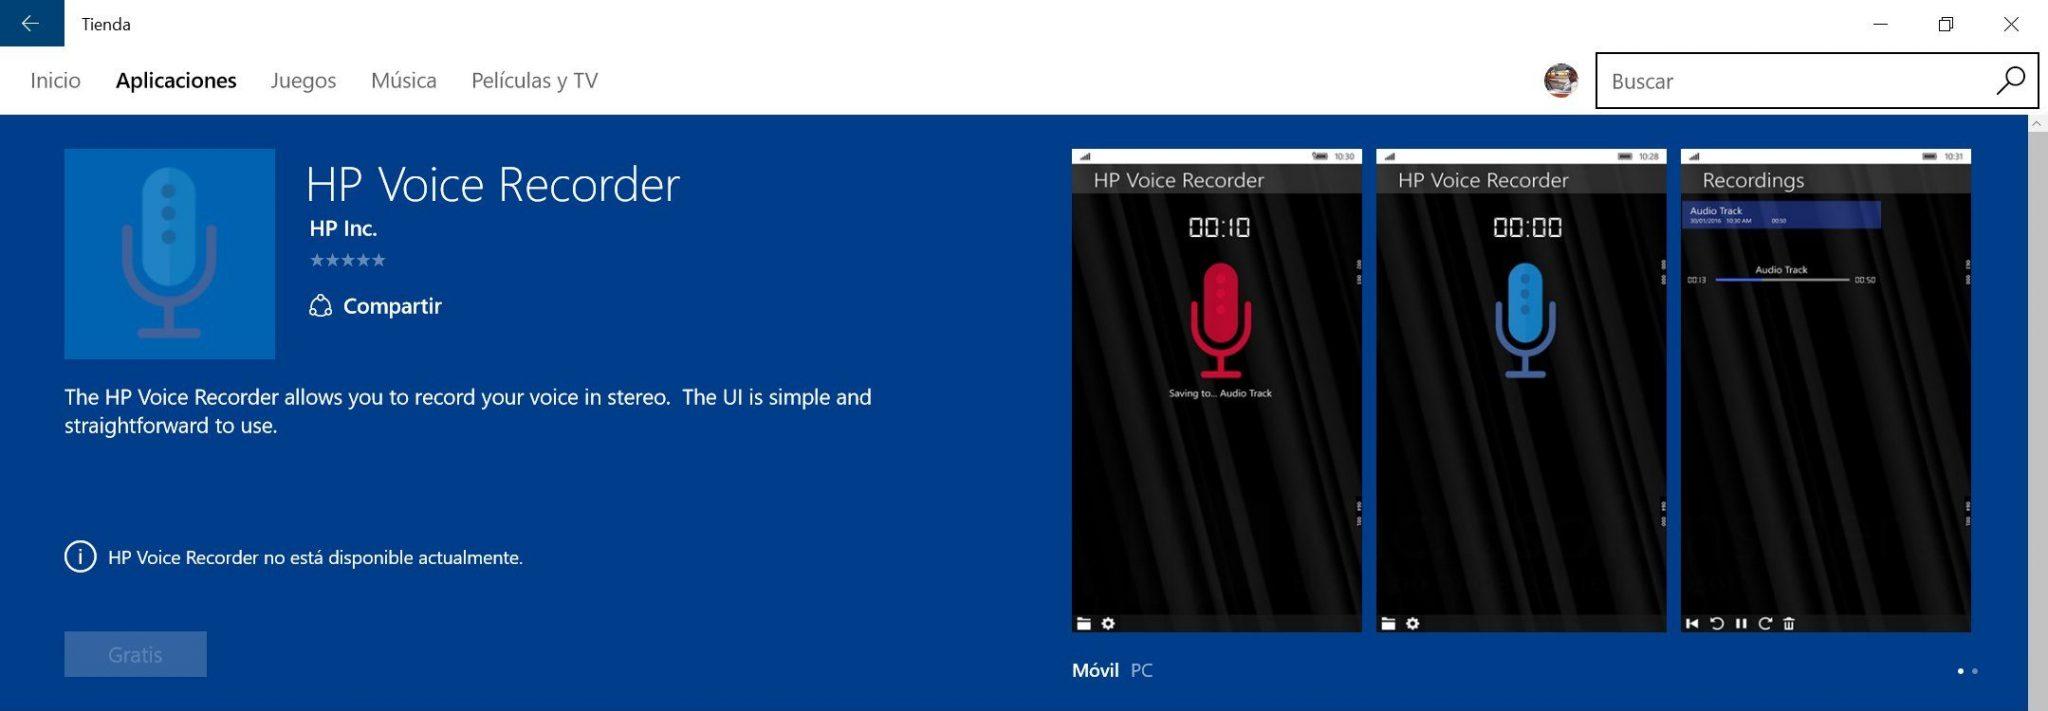 HP-Voice-Recorder